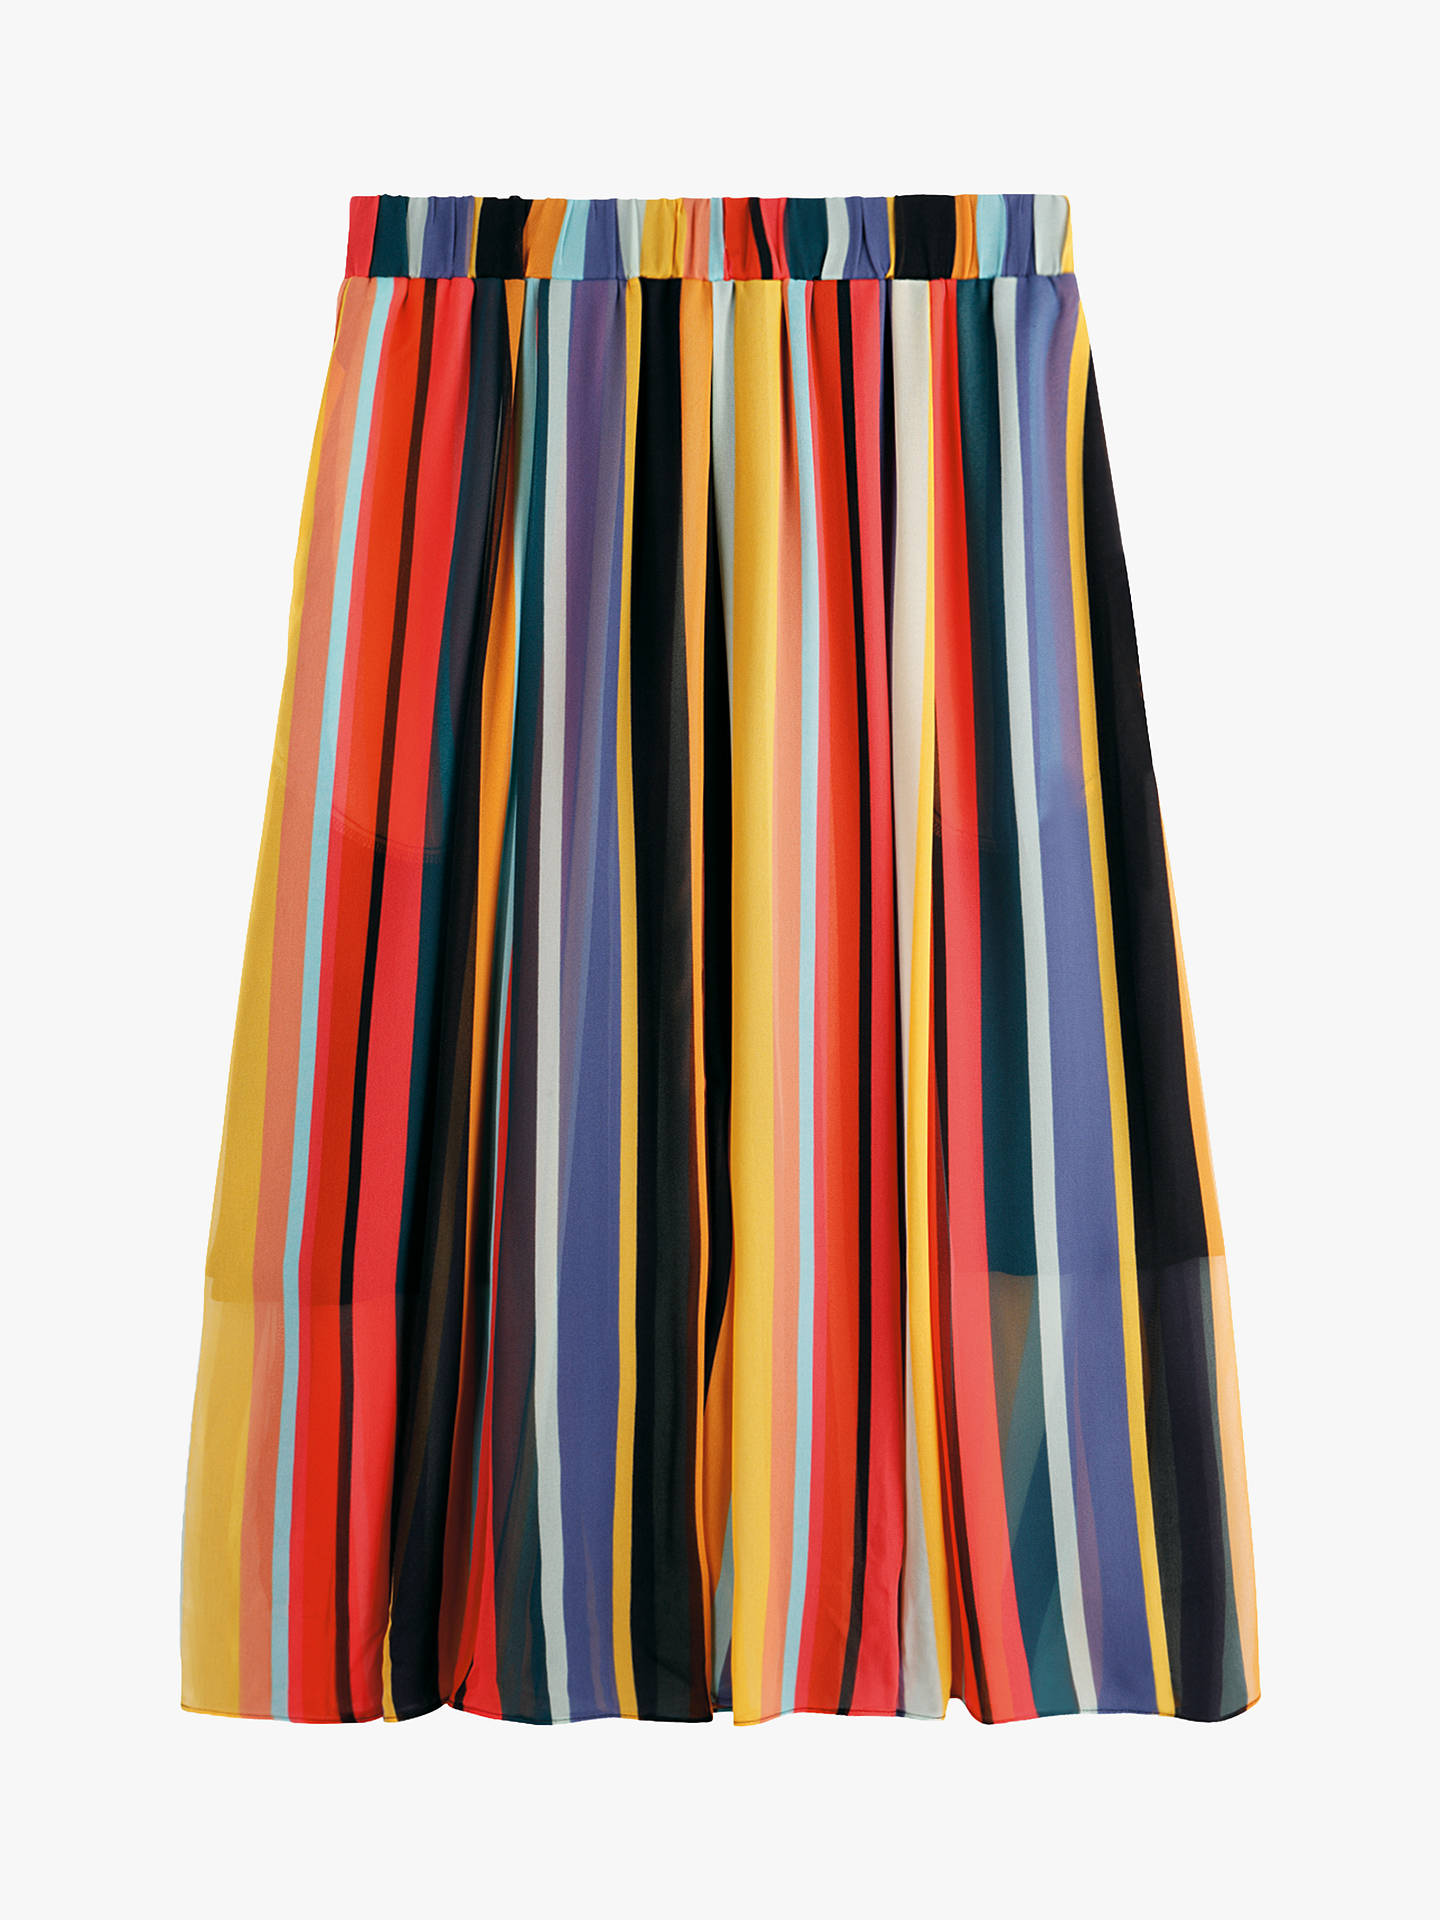 52cb758b5 ... Buy hush Marina Stripe Skirt, Multi, 6 Online at johnlewis.com ...